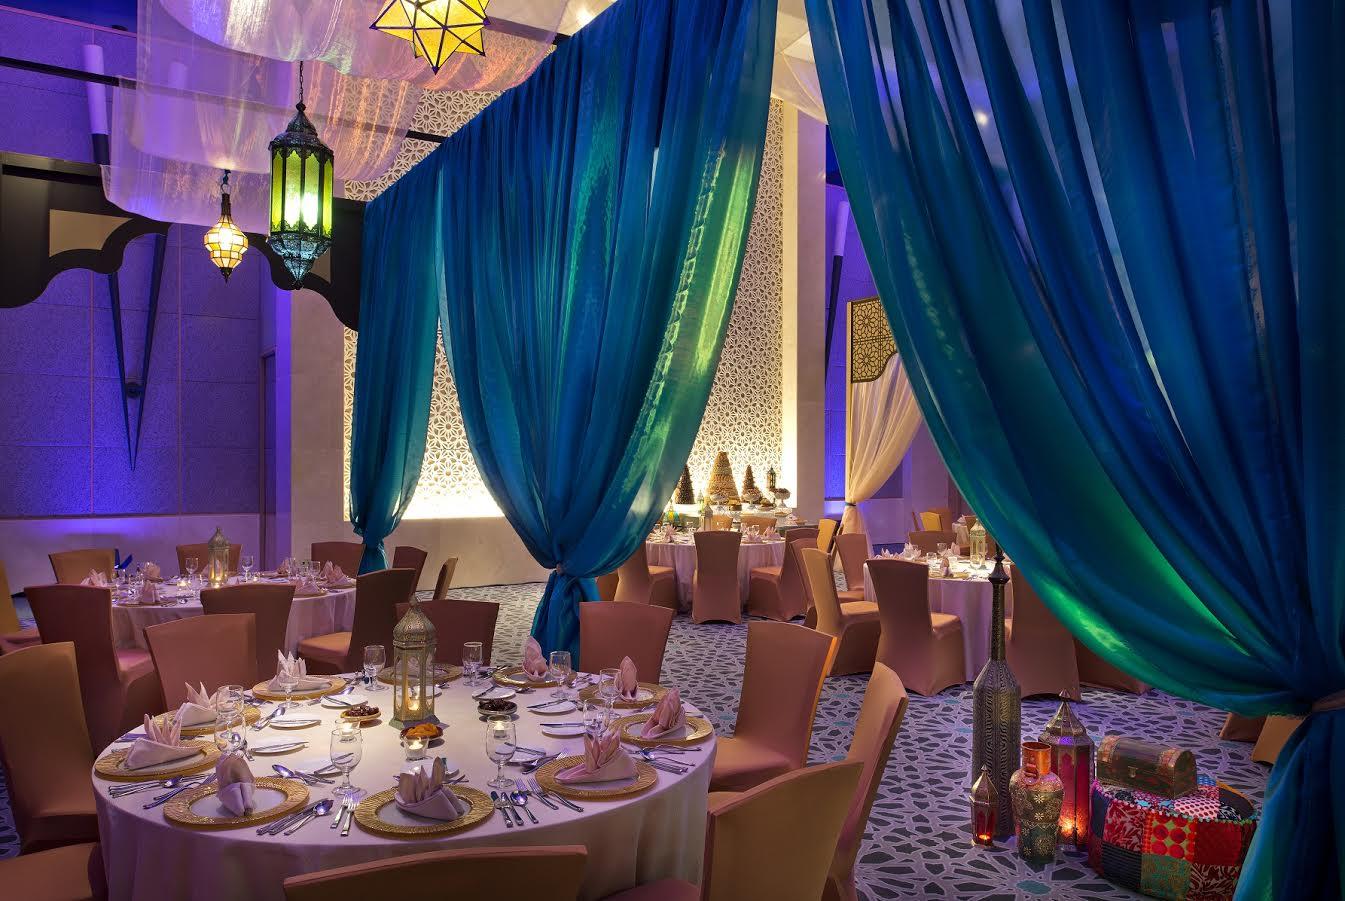 عروض العنوان دبي مول خلال رمضان 2017